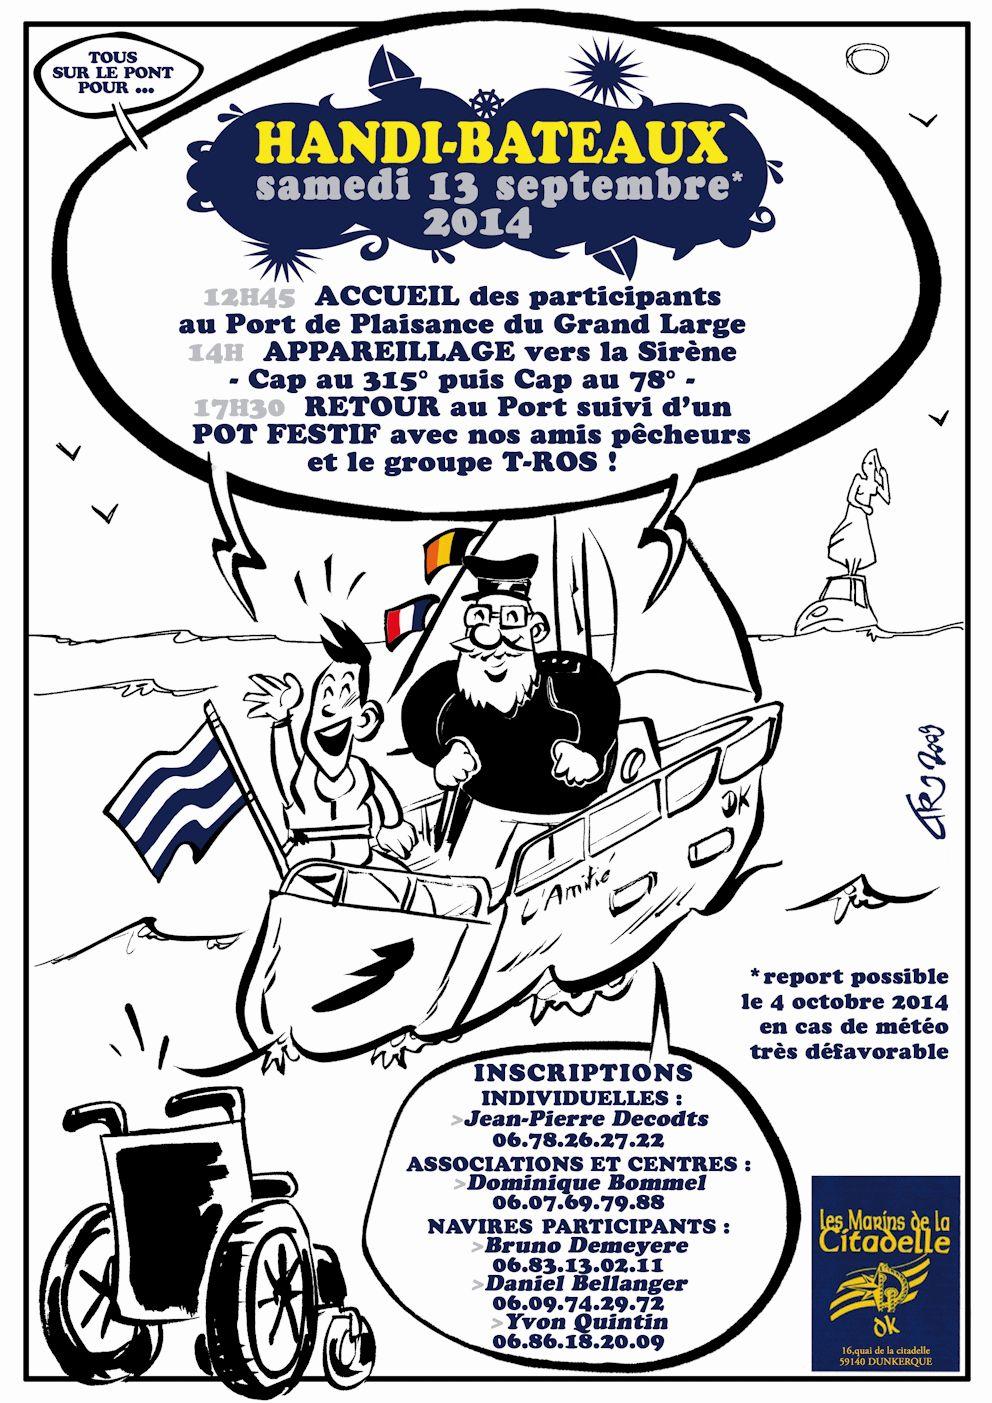 Affiche Handi-bateau 2014